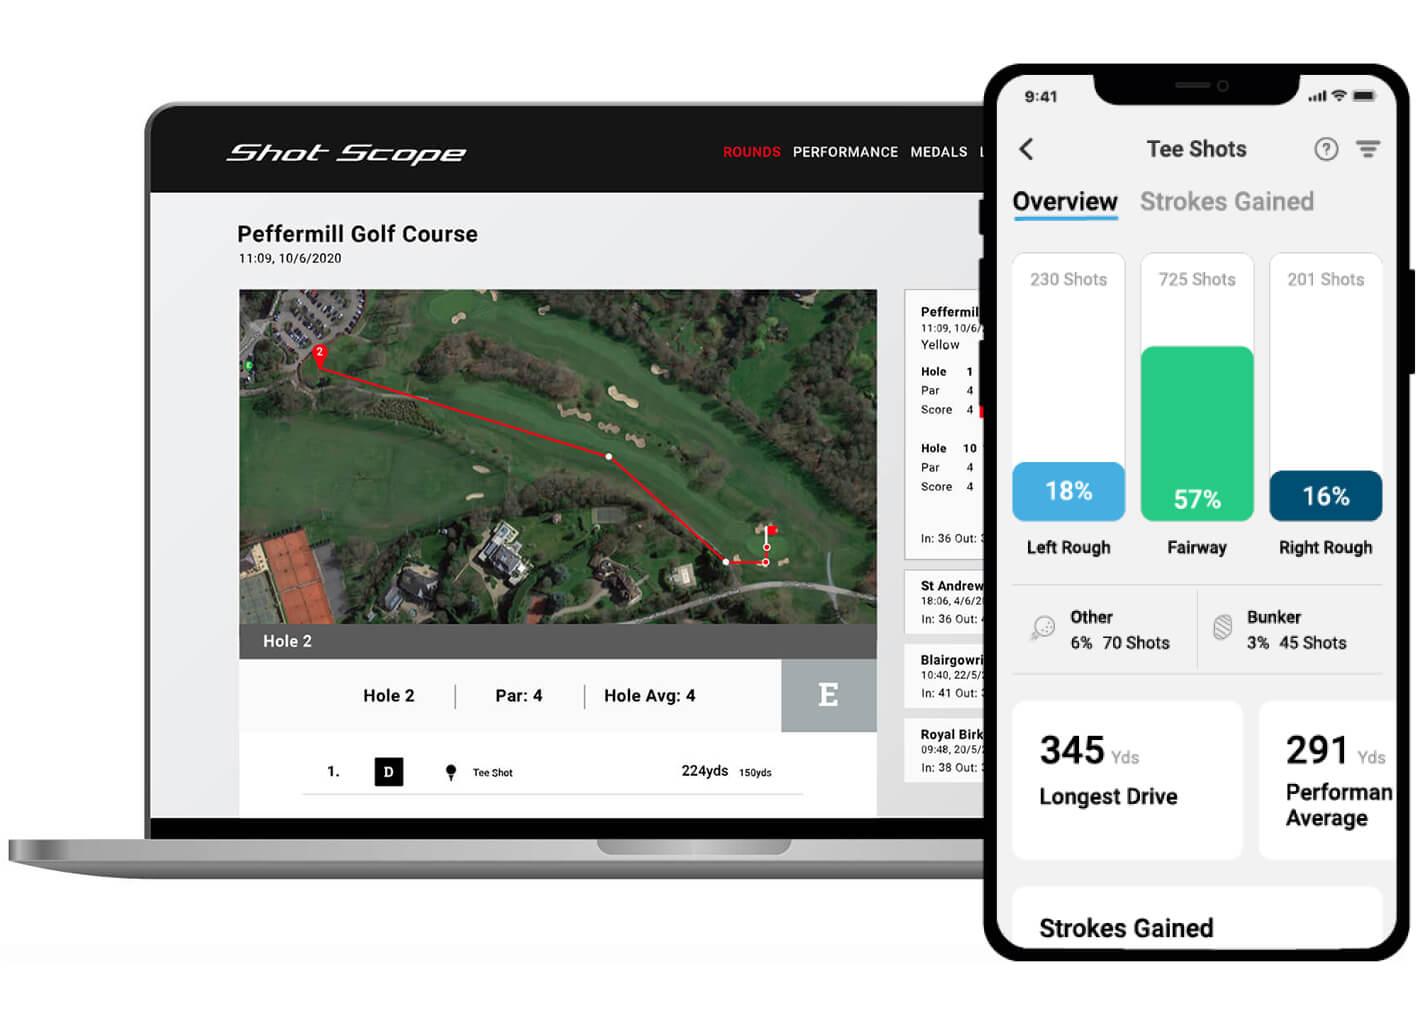 The Shot Scope mobile dashboard and app platform